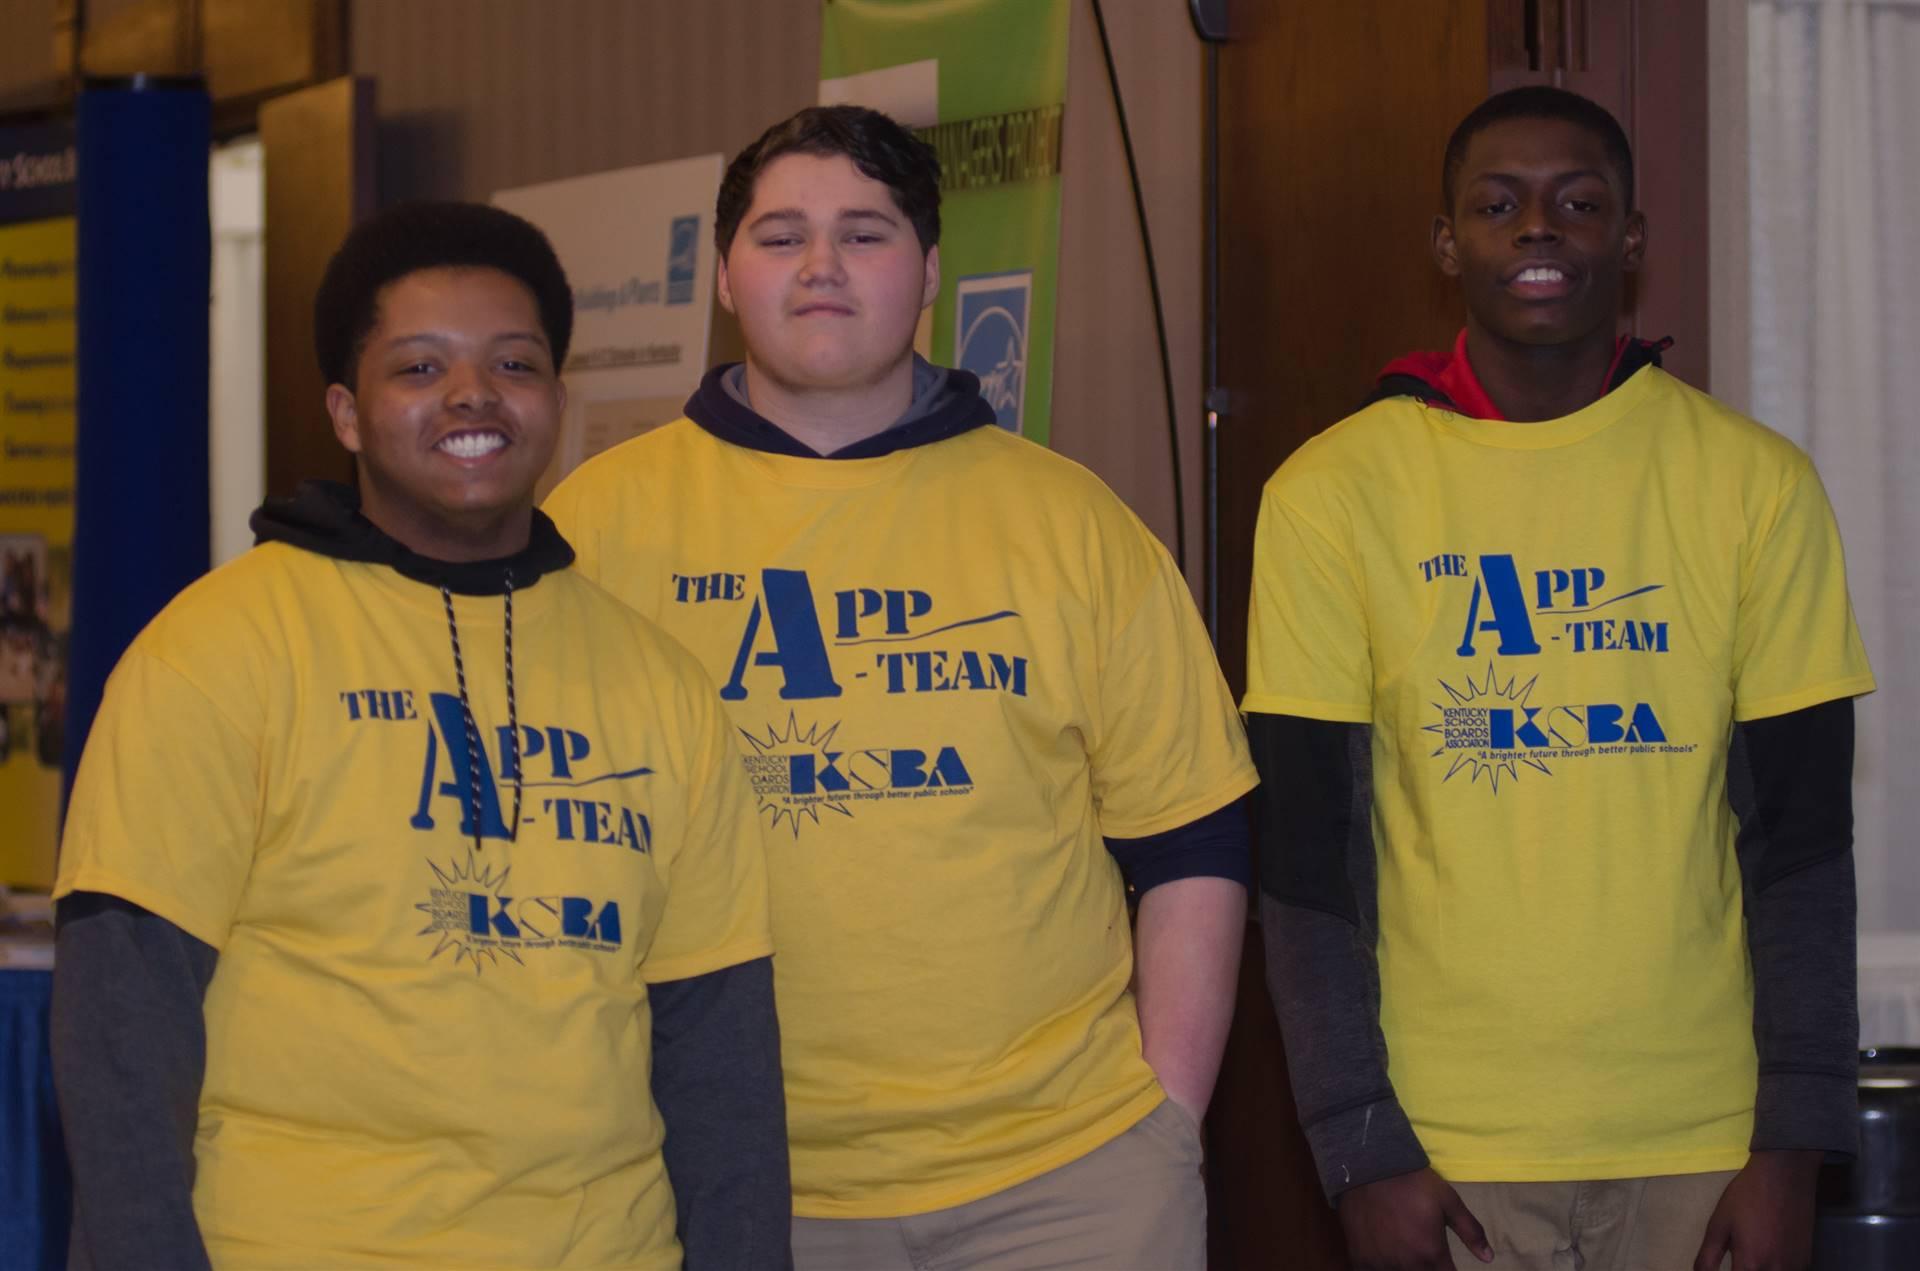 KSBA App Team from Louisville Central High School